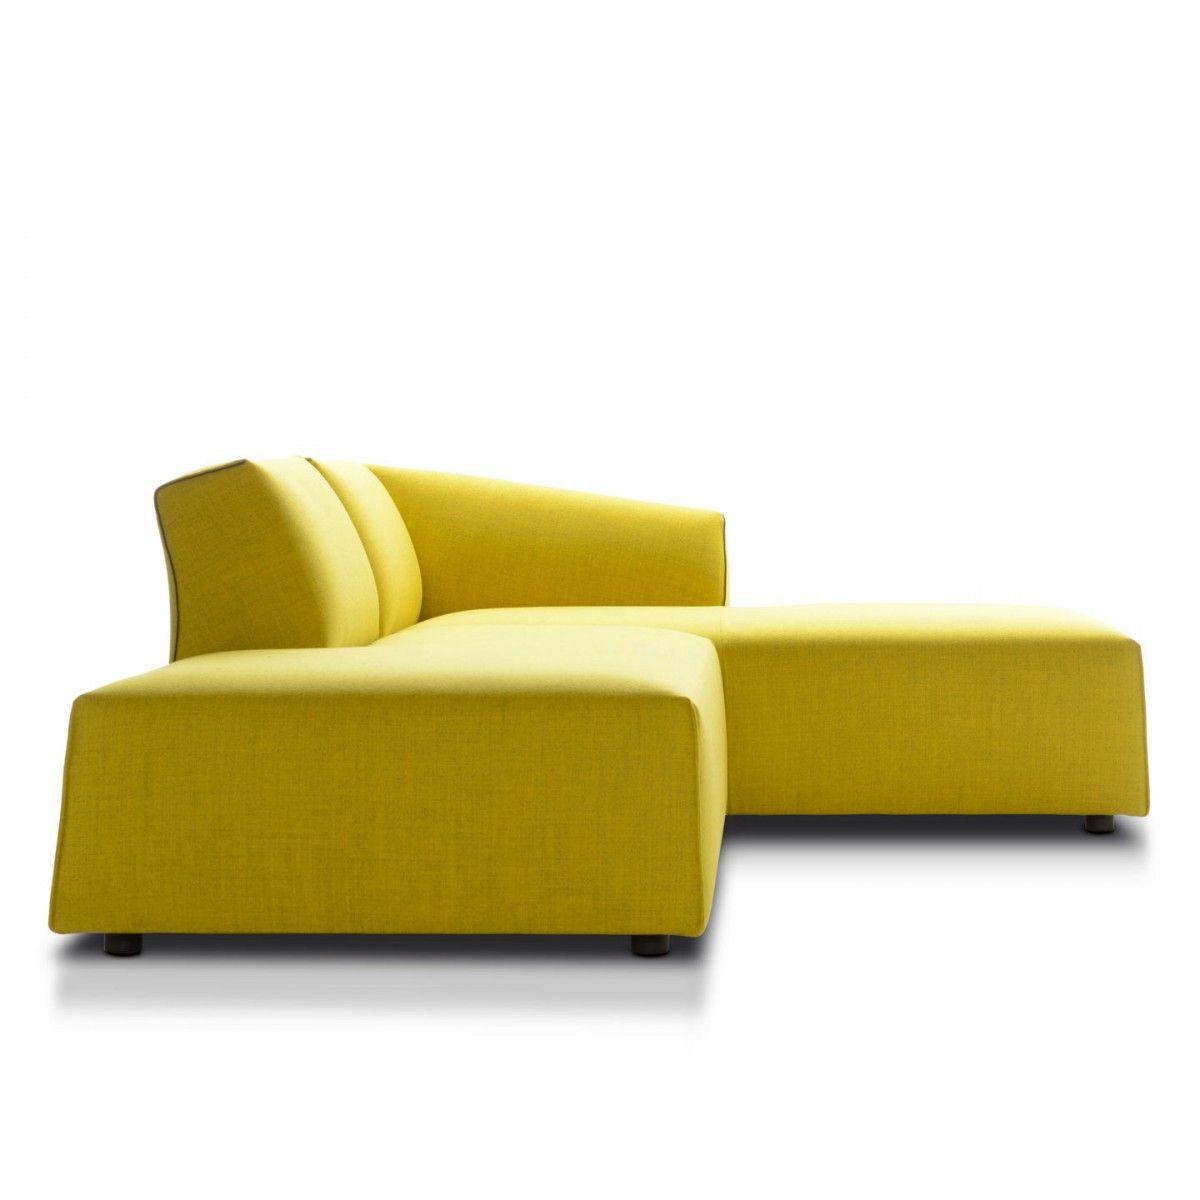 Thea modular sofa - MDF Italia | Furniture Seating | Pinterest ...